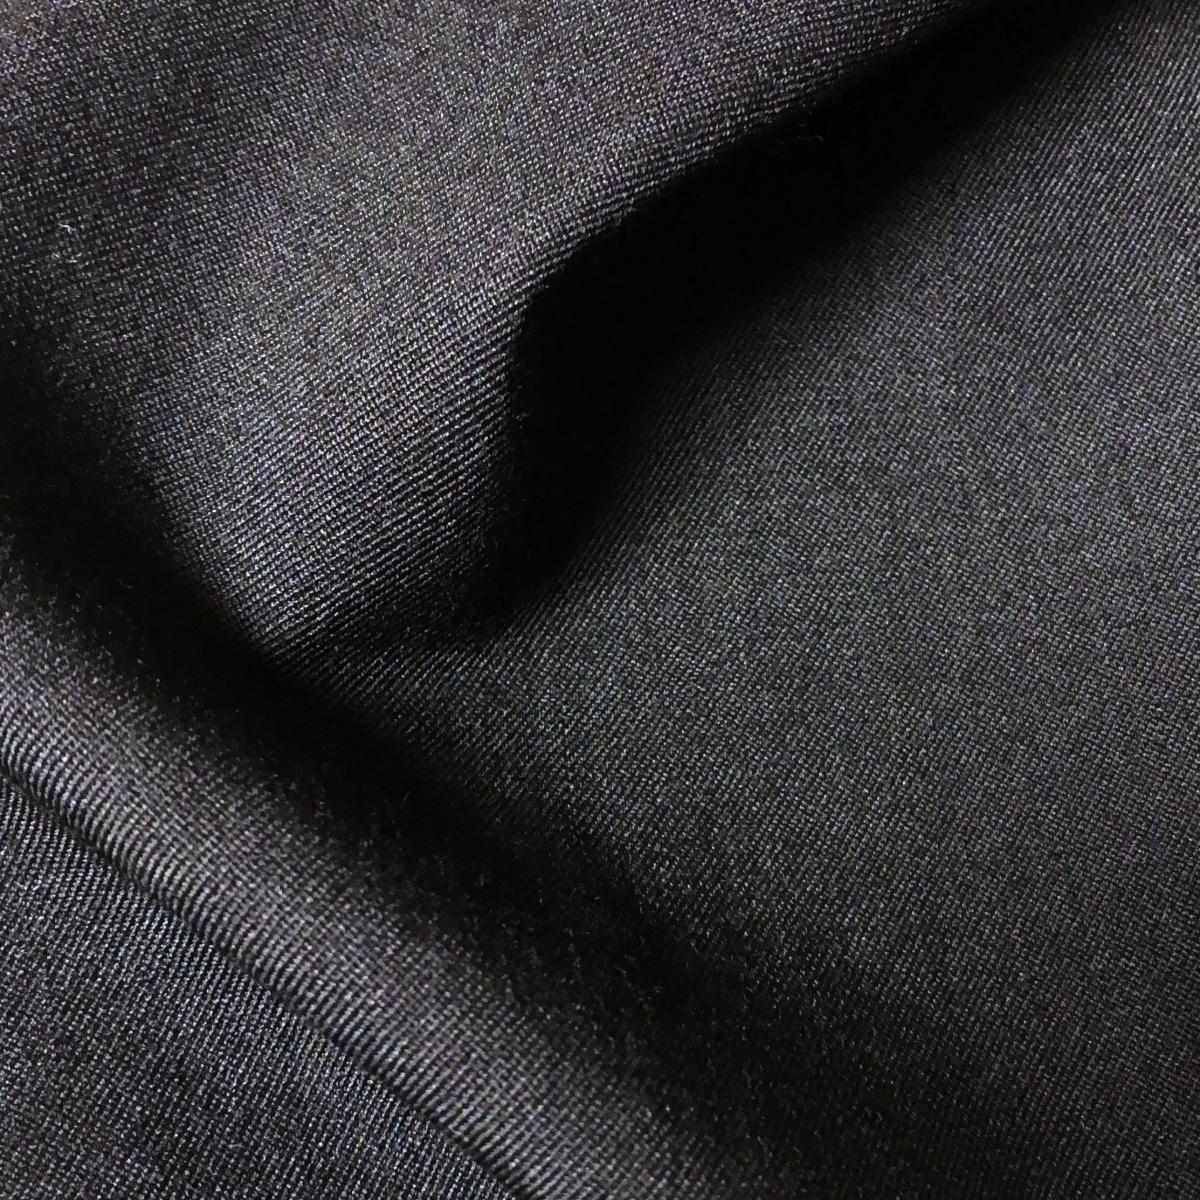 17SS YOHJI YAMAMOTO POUR HOMME ヨウジヤマモトプールオム ラップパンツ シワギャバ ウールギャバ ハーフパンツ H-右前垂らし布Pギャバ_シワギャバ生地感アップ。